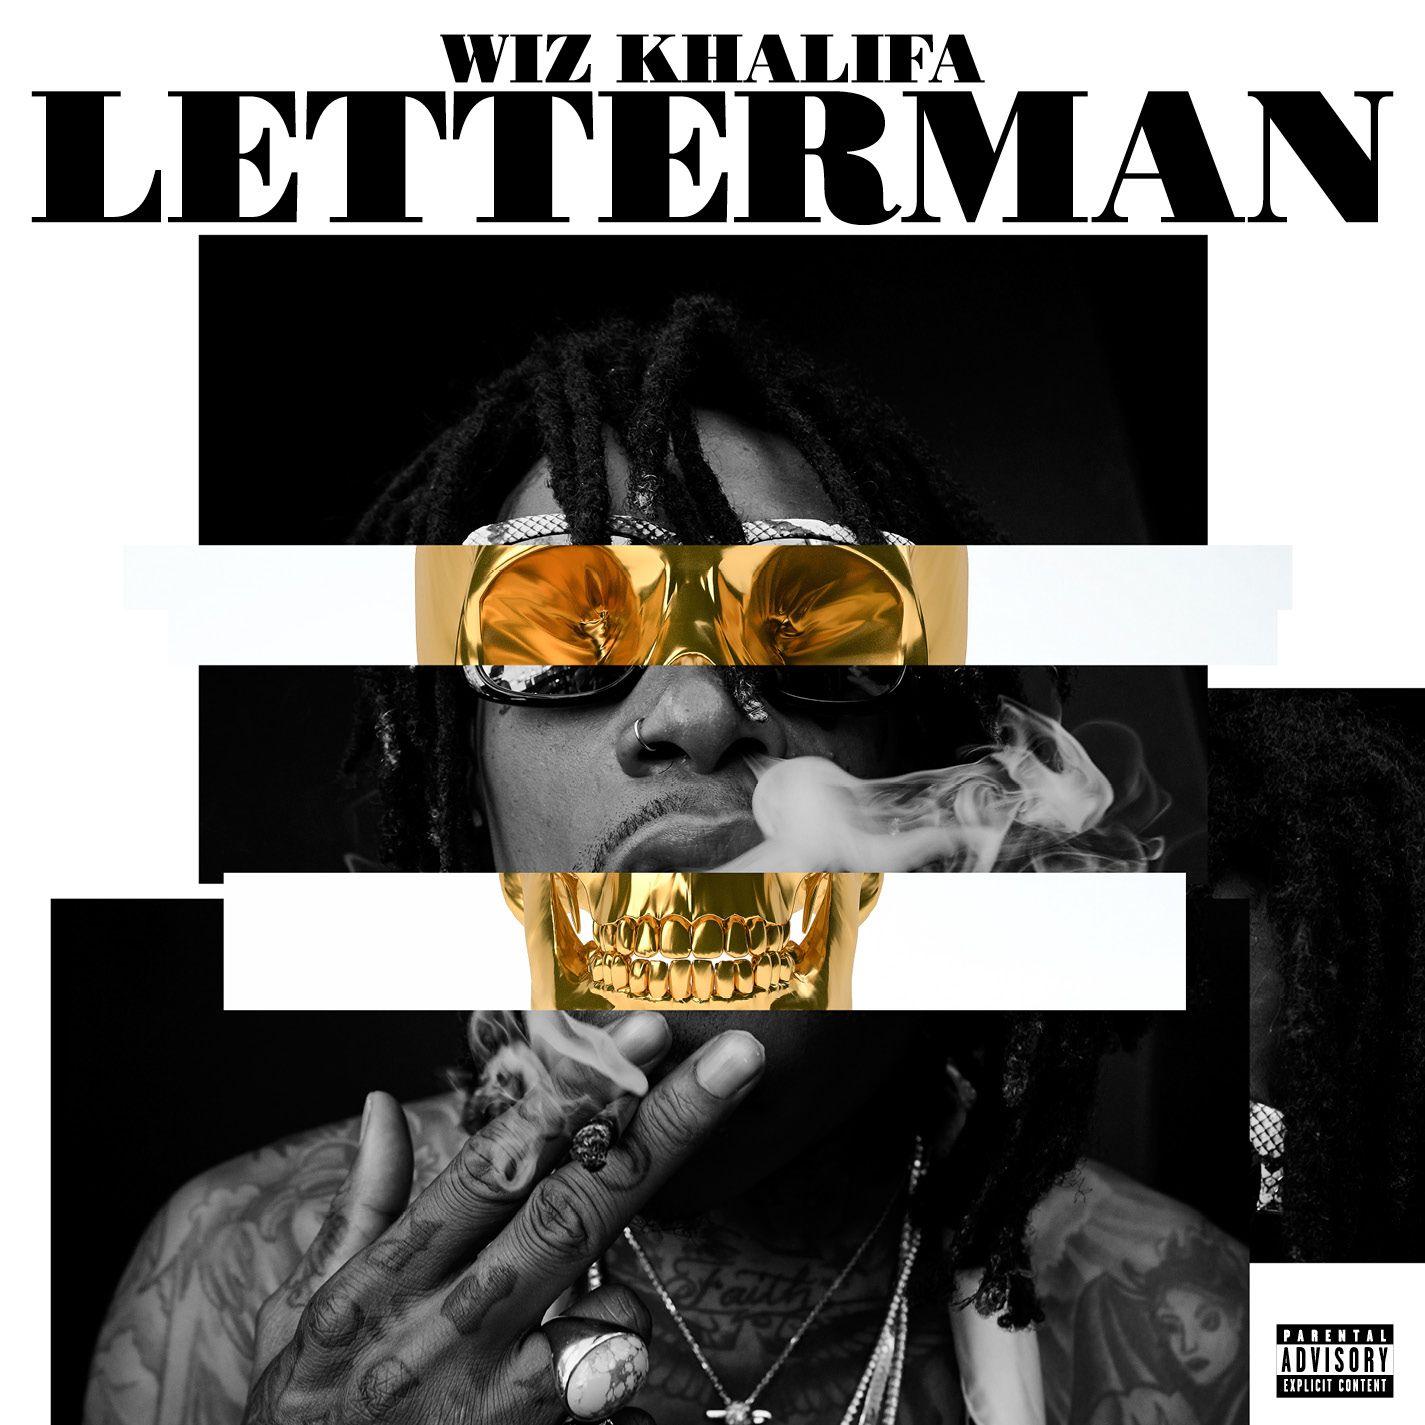 Wiz Khalifa – Letterman